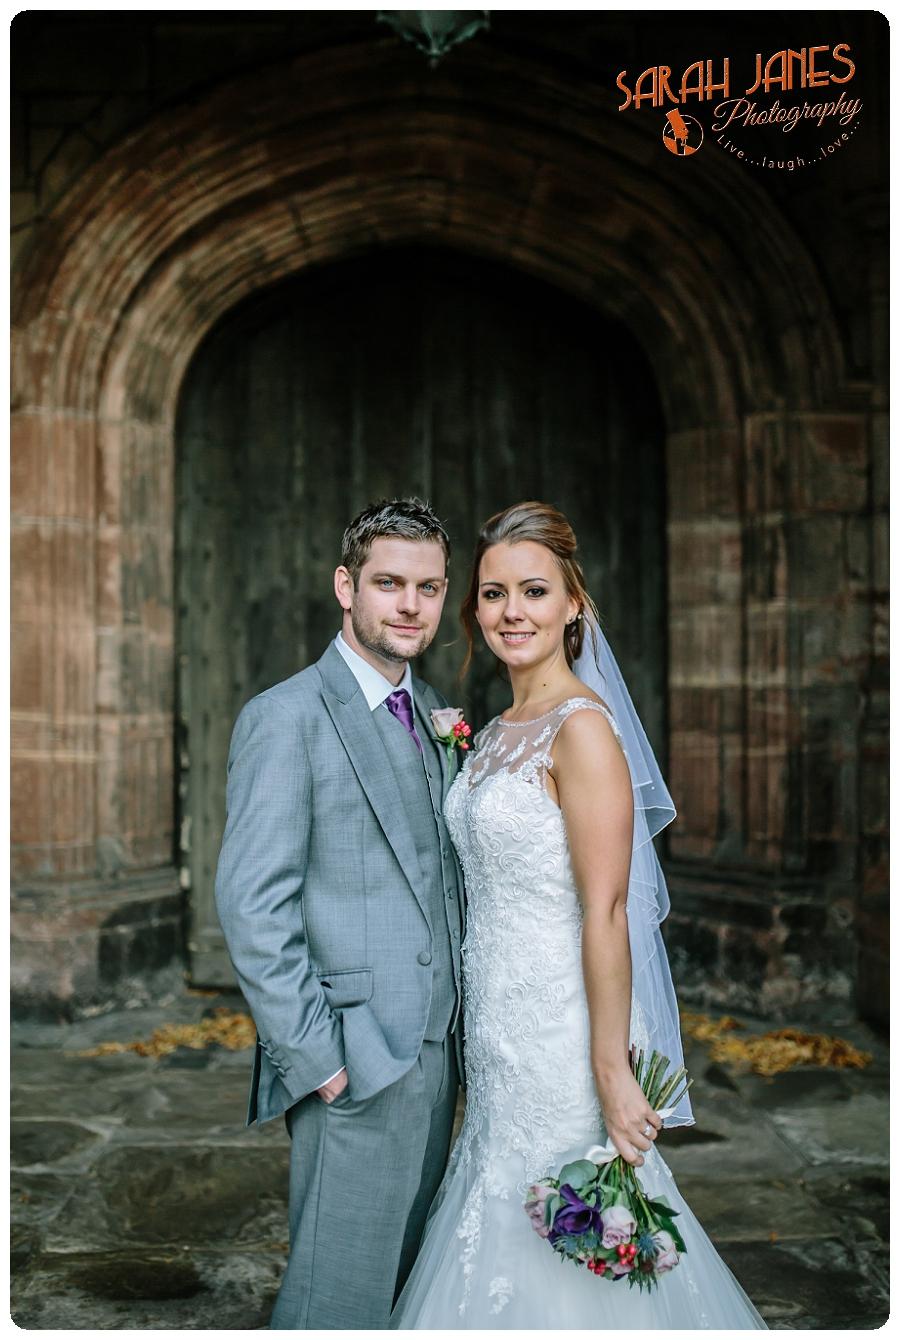 Wedding photography Chester, Weddings Rowton Hall, Wedding photography at Rowton Hall, Sarah Janes Photograpphy_0027.jpg